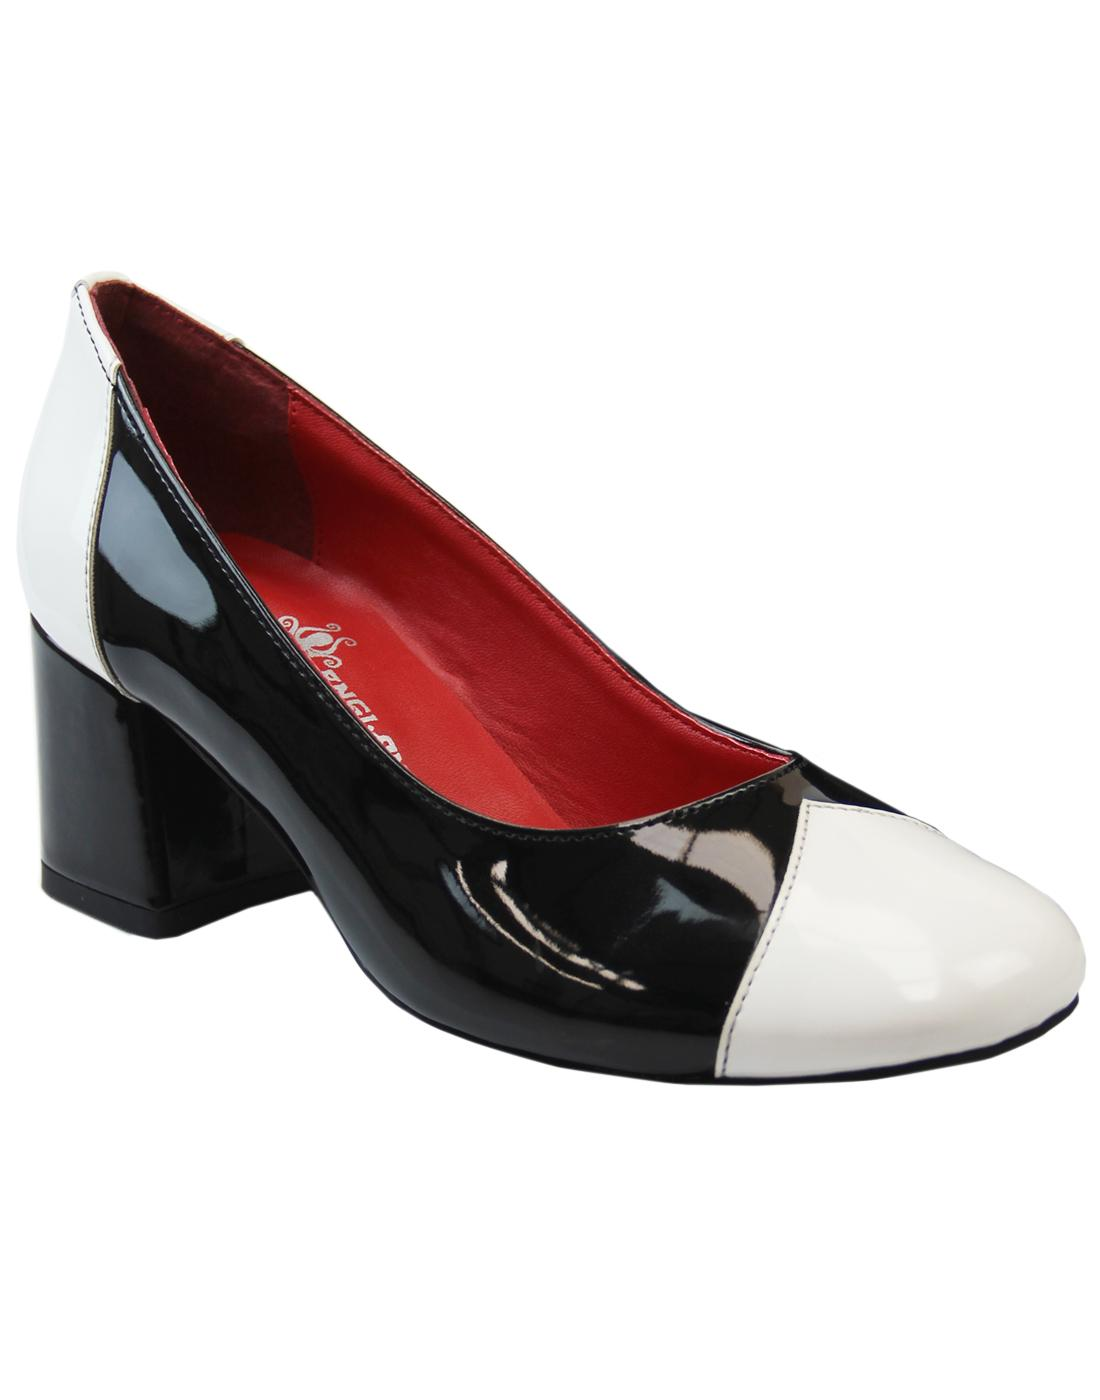 Sylvie MADCAP ENGLAND Women's 60s Mod Heels